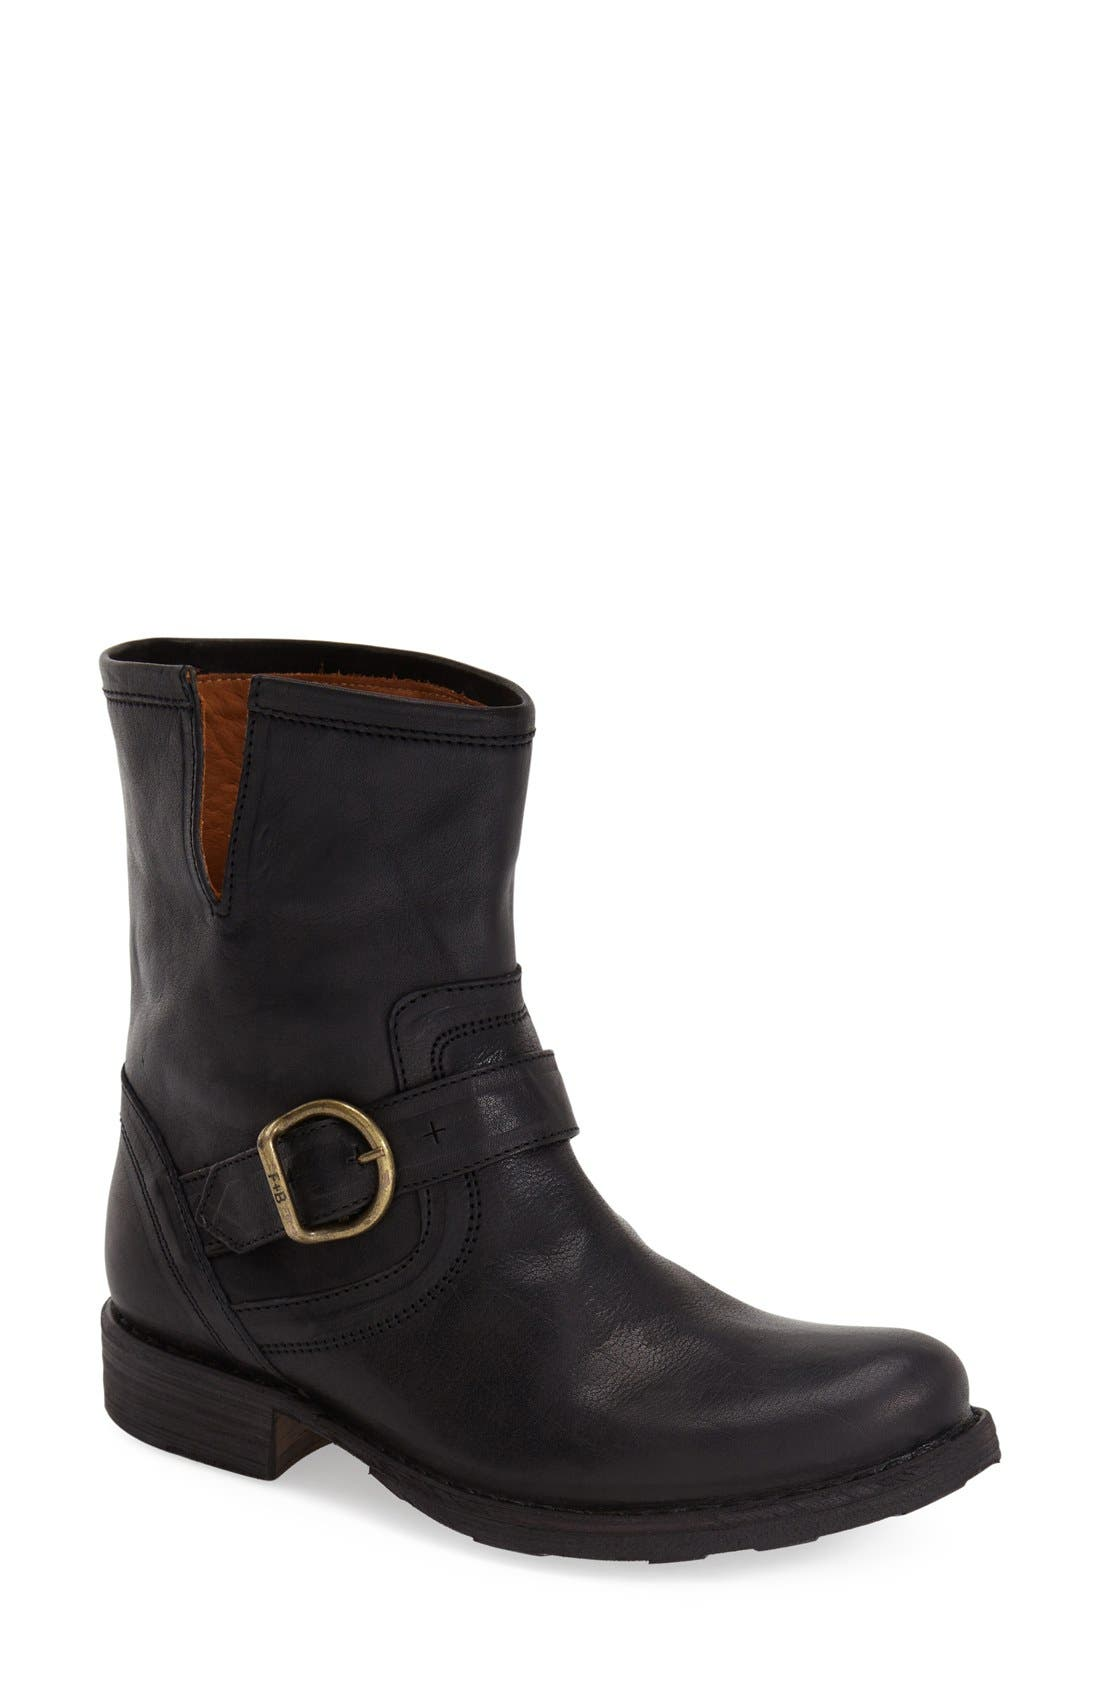 Fiorentini + Baker 'Eli' Buckle Strap Boot (Women)